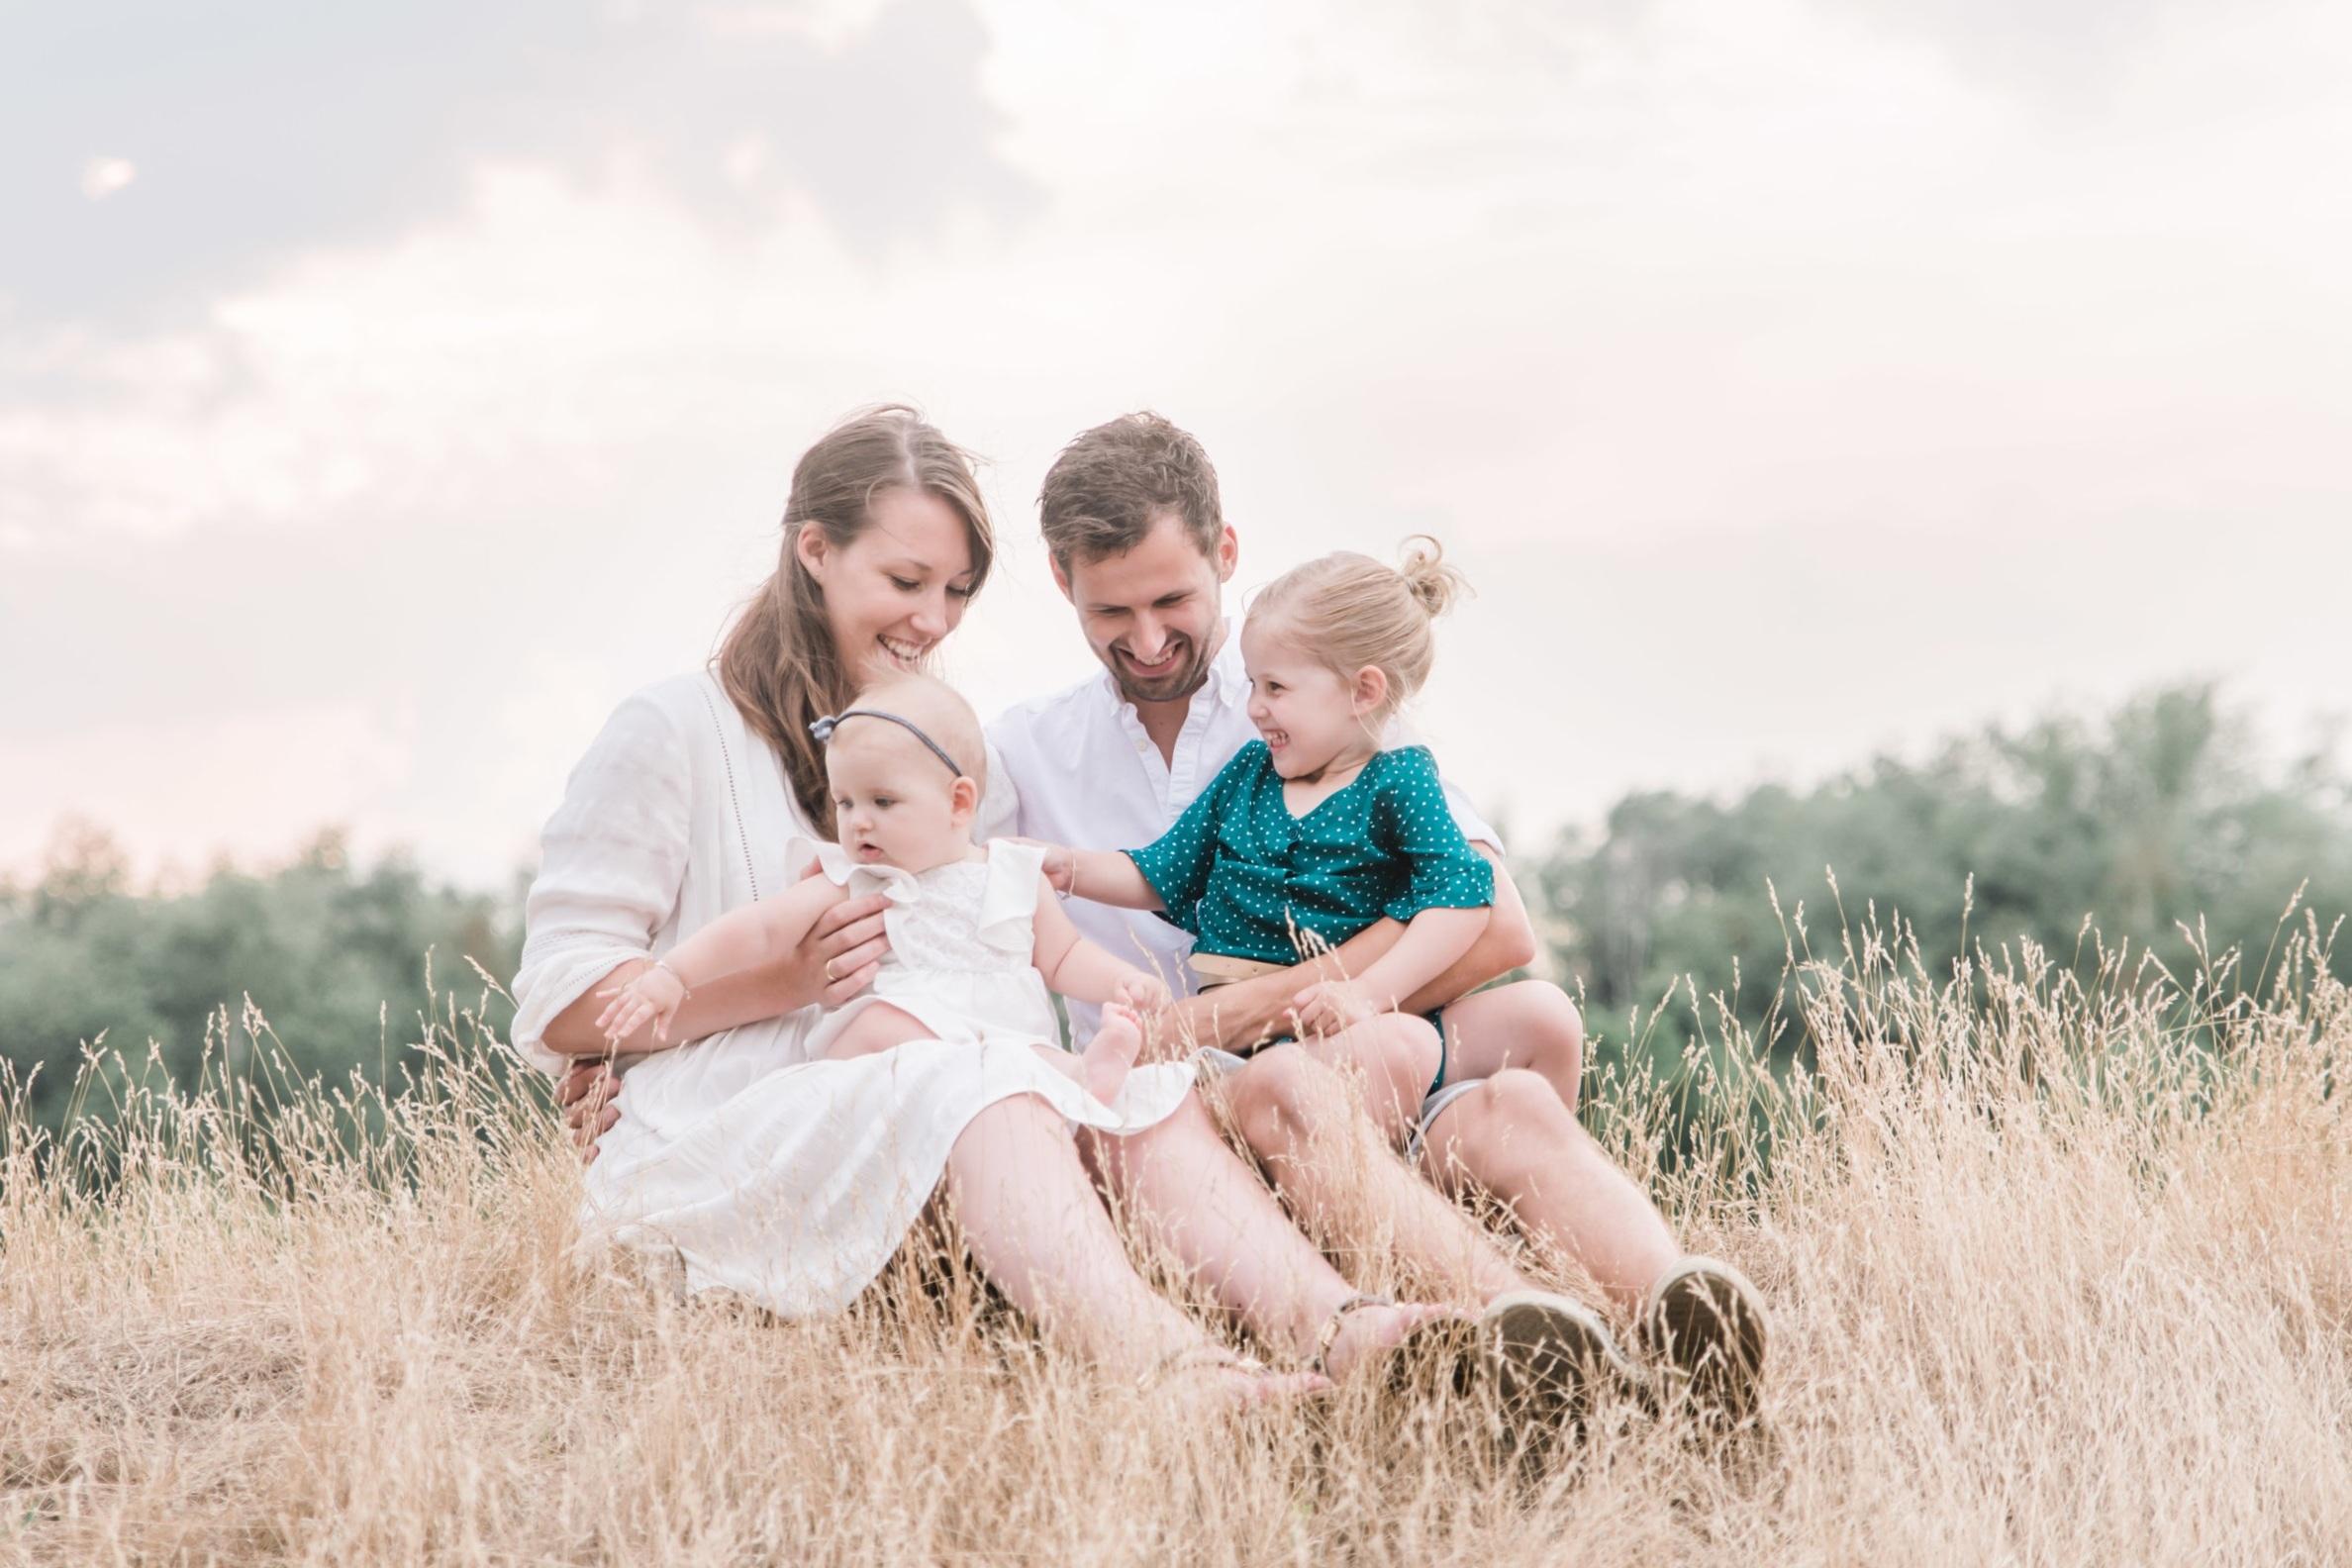 gezinsfoto laten maken woudenberg, gezinsfoto amersfoort